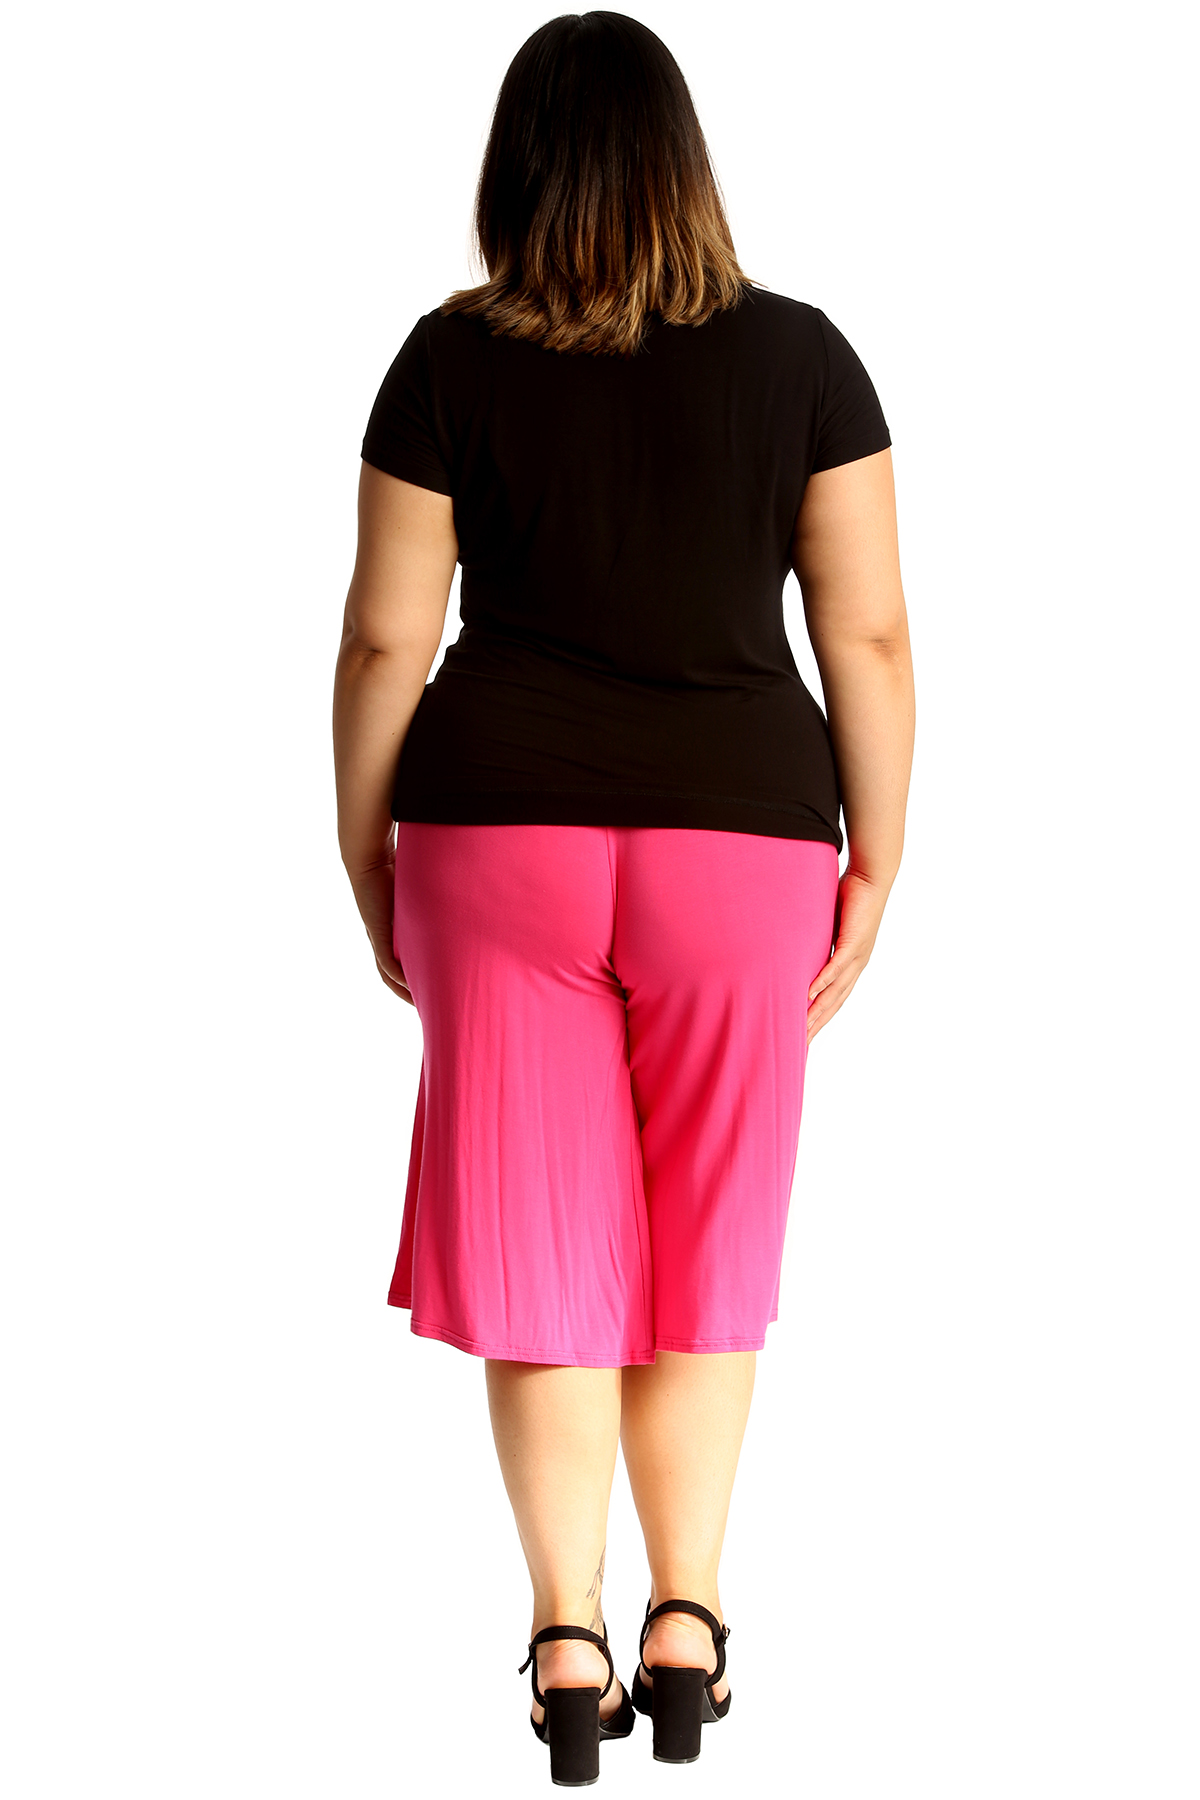 New-Womens-Plus-Size-Culottes-Ladies-Plain-Shorts-Palazzo-Elastic-Pants-Summer thumbnail 20